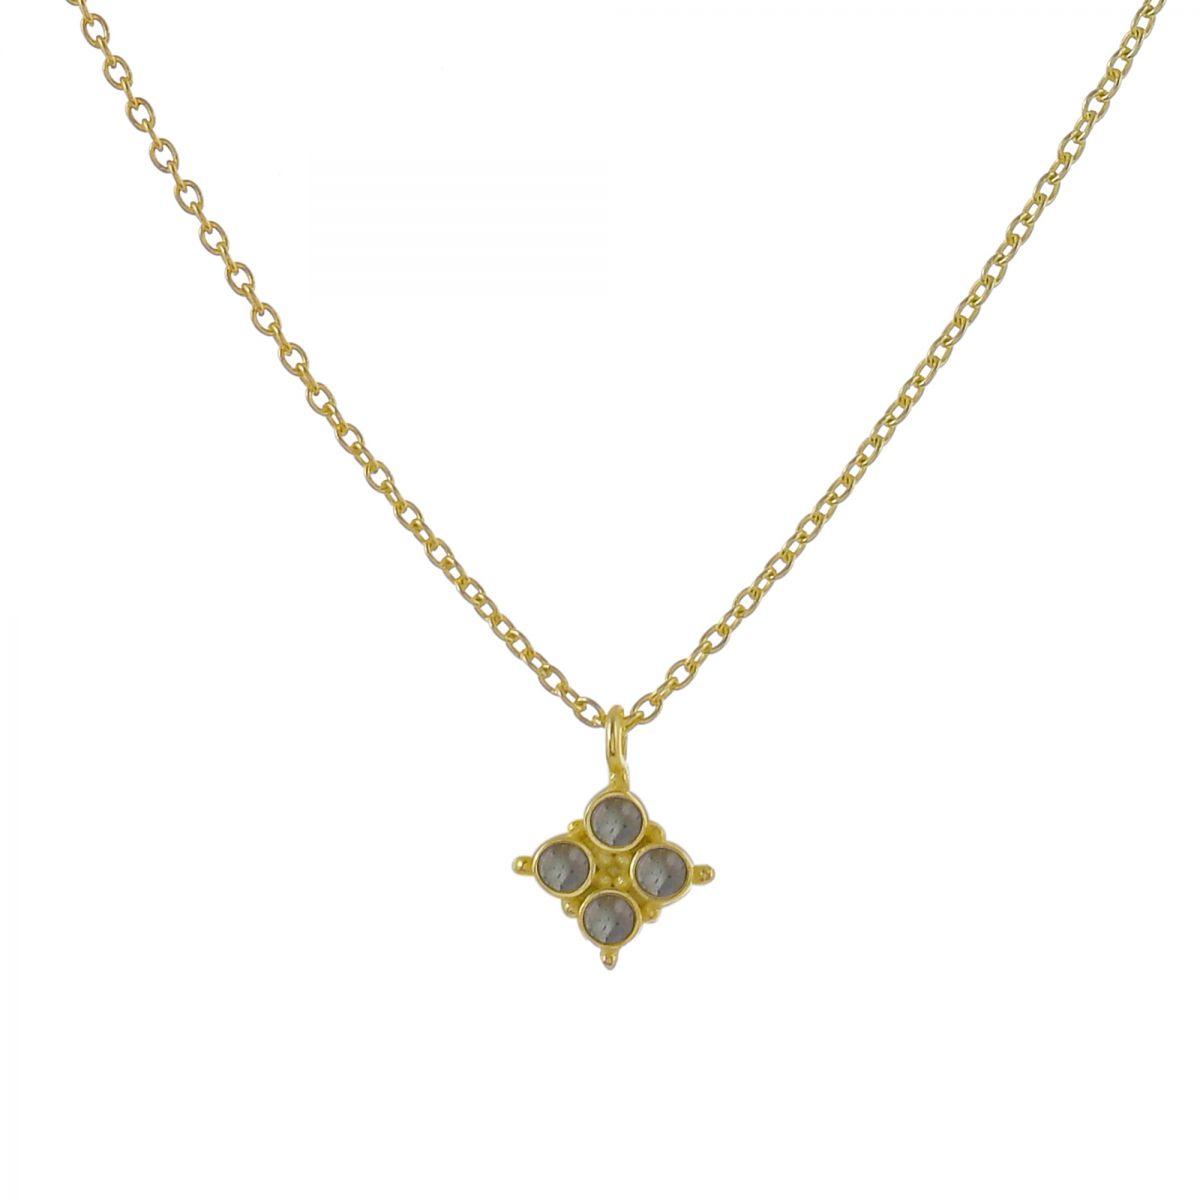 hcollier 4 labradorite stones gold plated